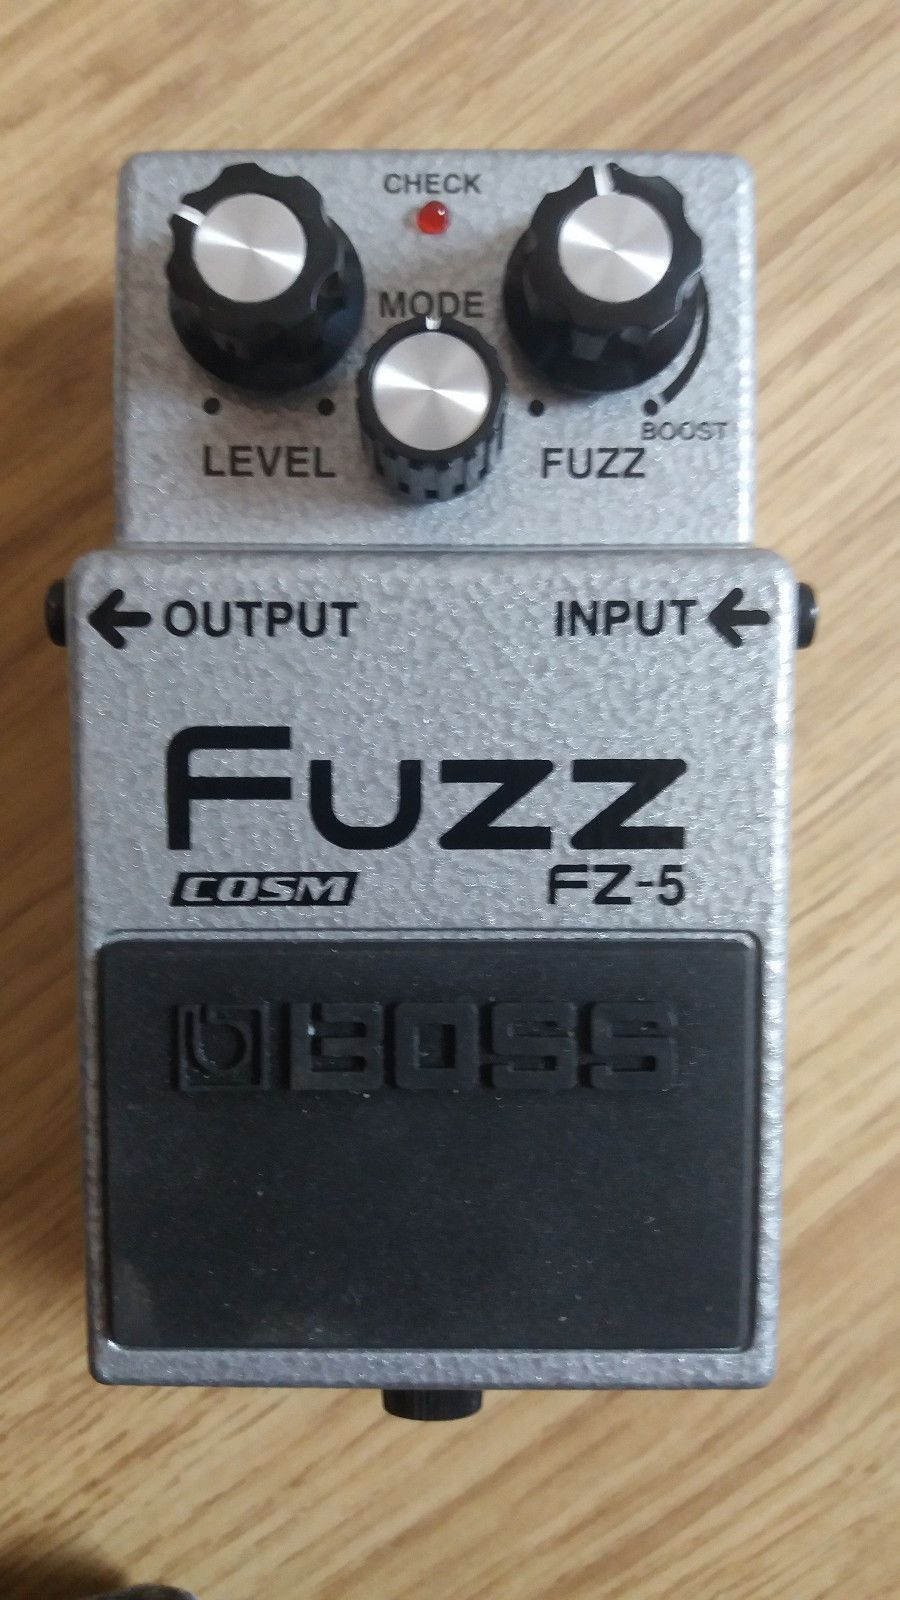 boss fz 5 fuzz box guitar effects pedal boxed with manual guitarboss fz 5 fuzz box guitar effects pedal boxed with manual